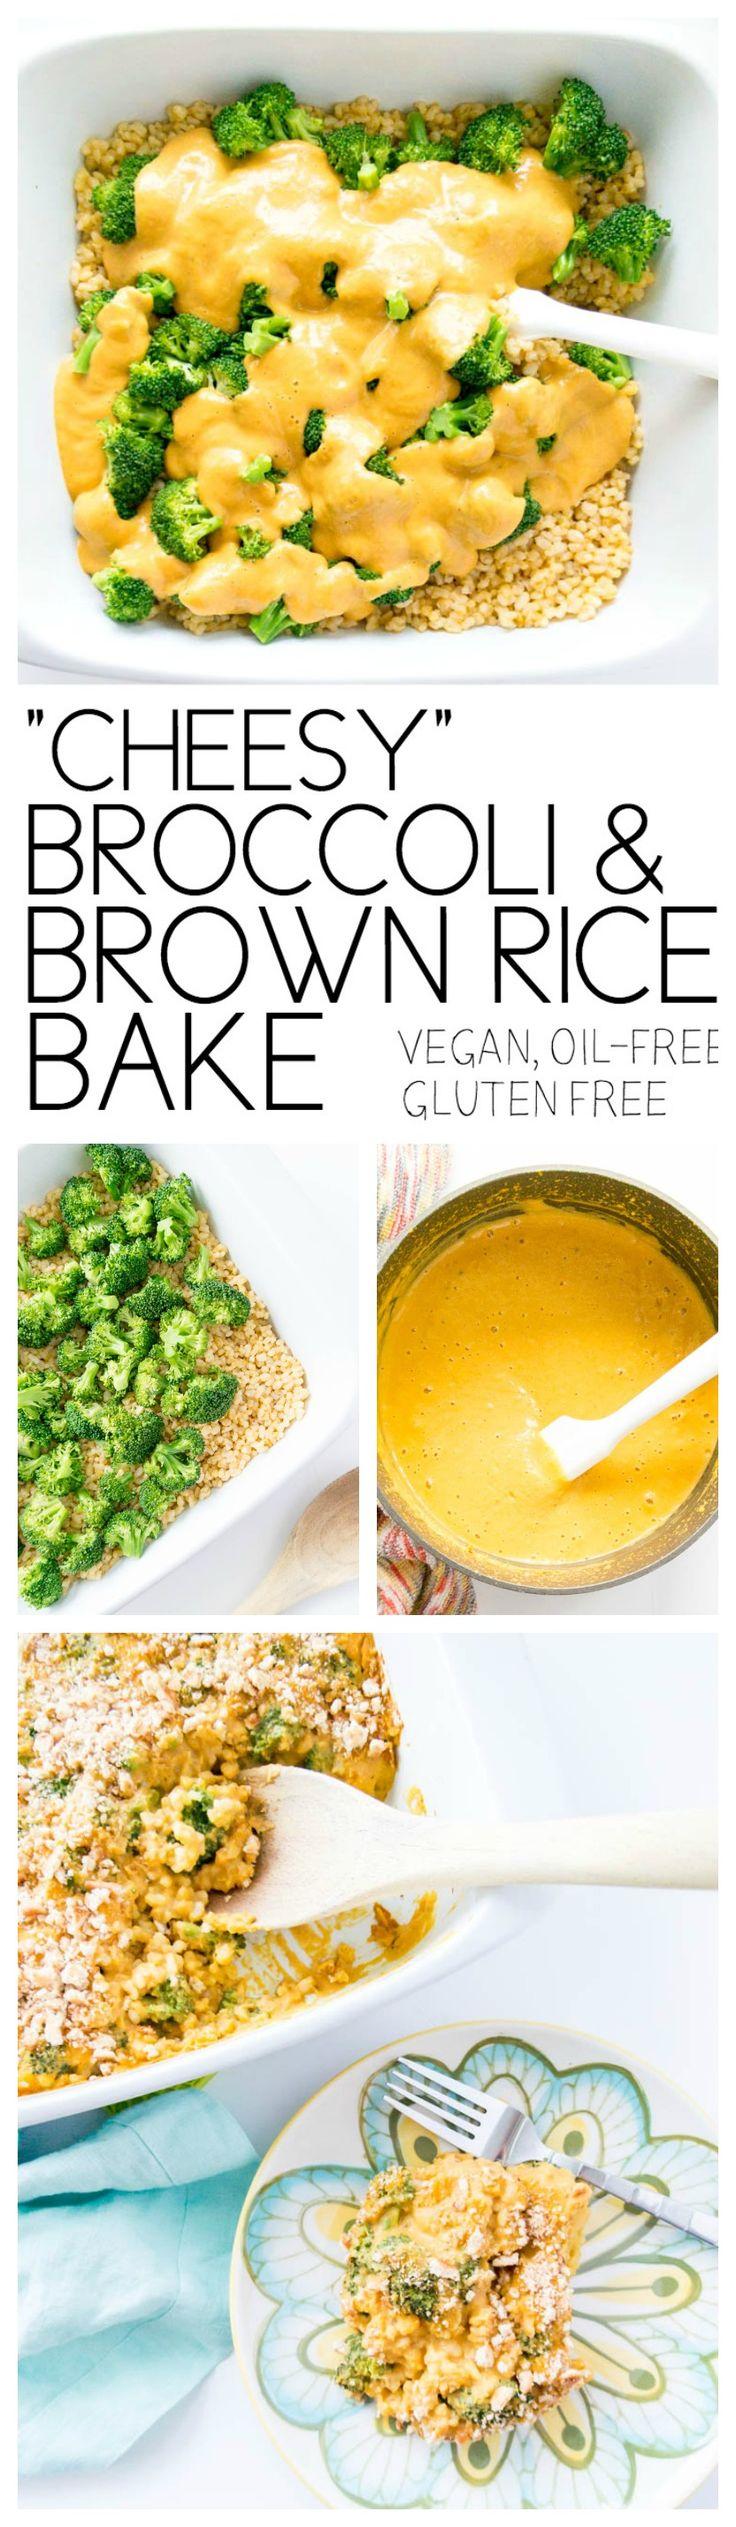 Best 25 cold dinner ideas ideas on pinterest summer dinner cheesy vegan broccoli brown rice bake forumfinder Gallery